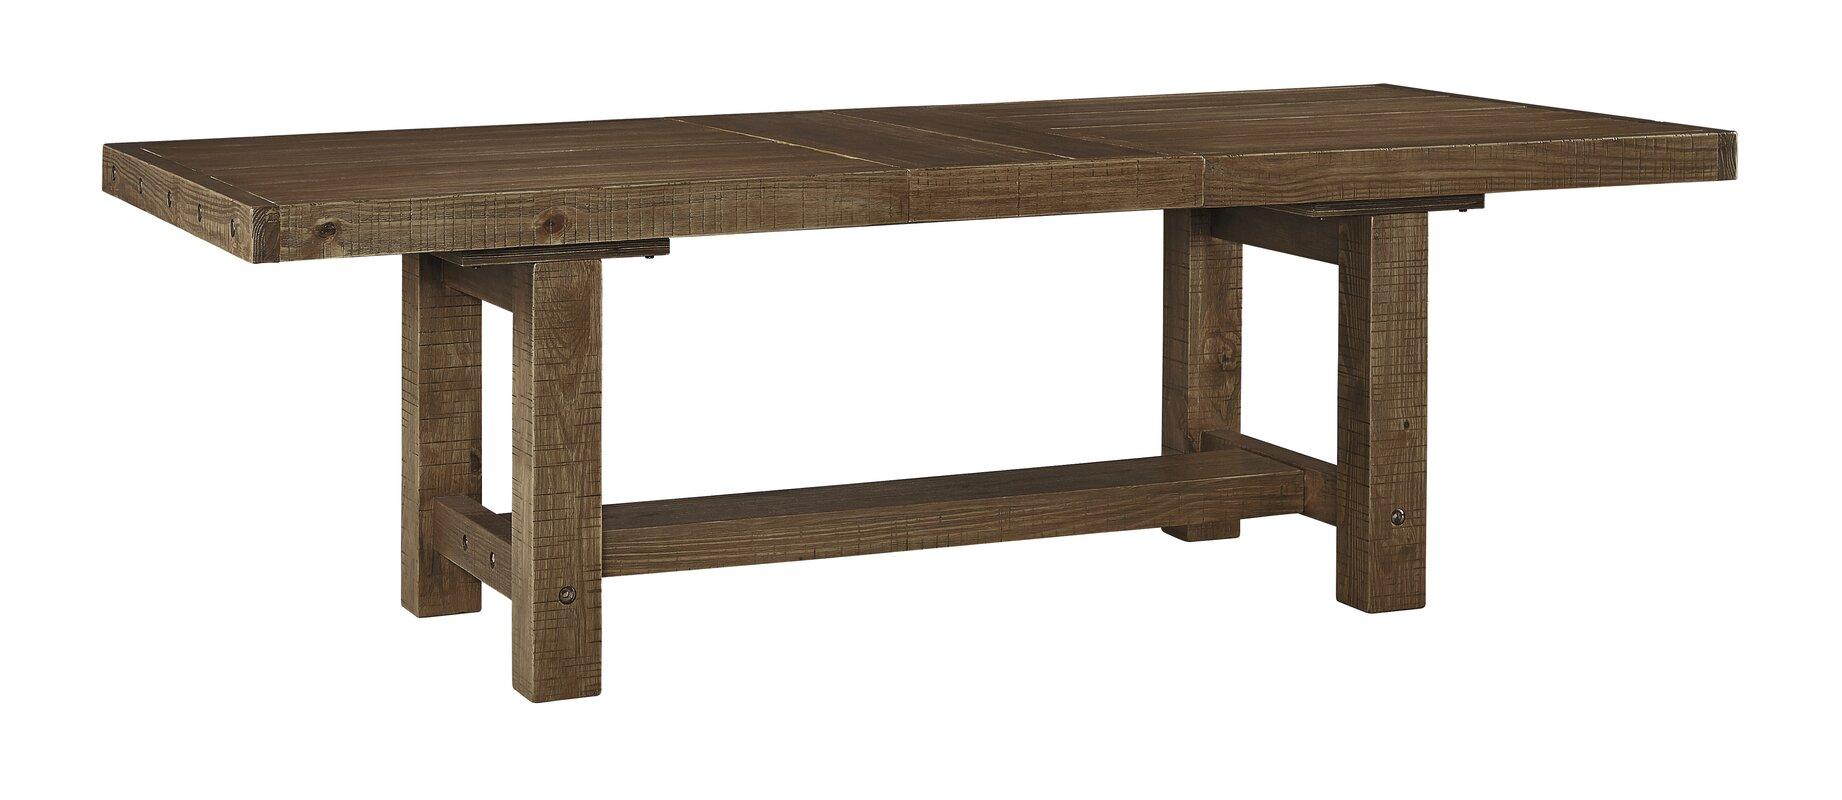 Lovely Etolin Extendable Dining Table